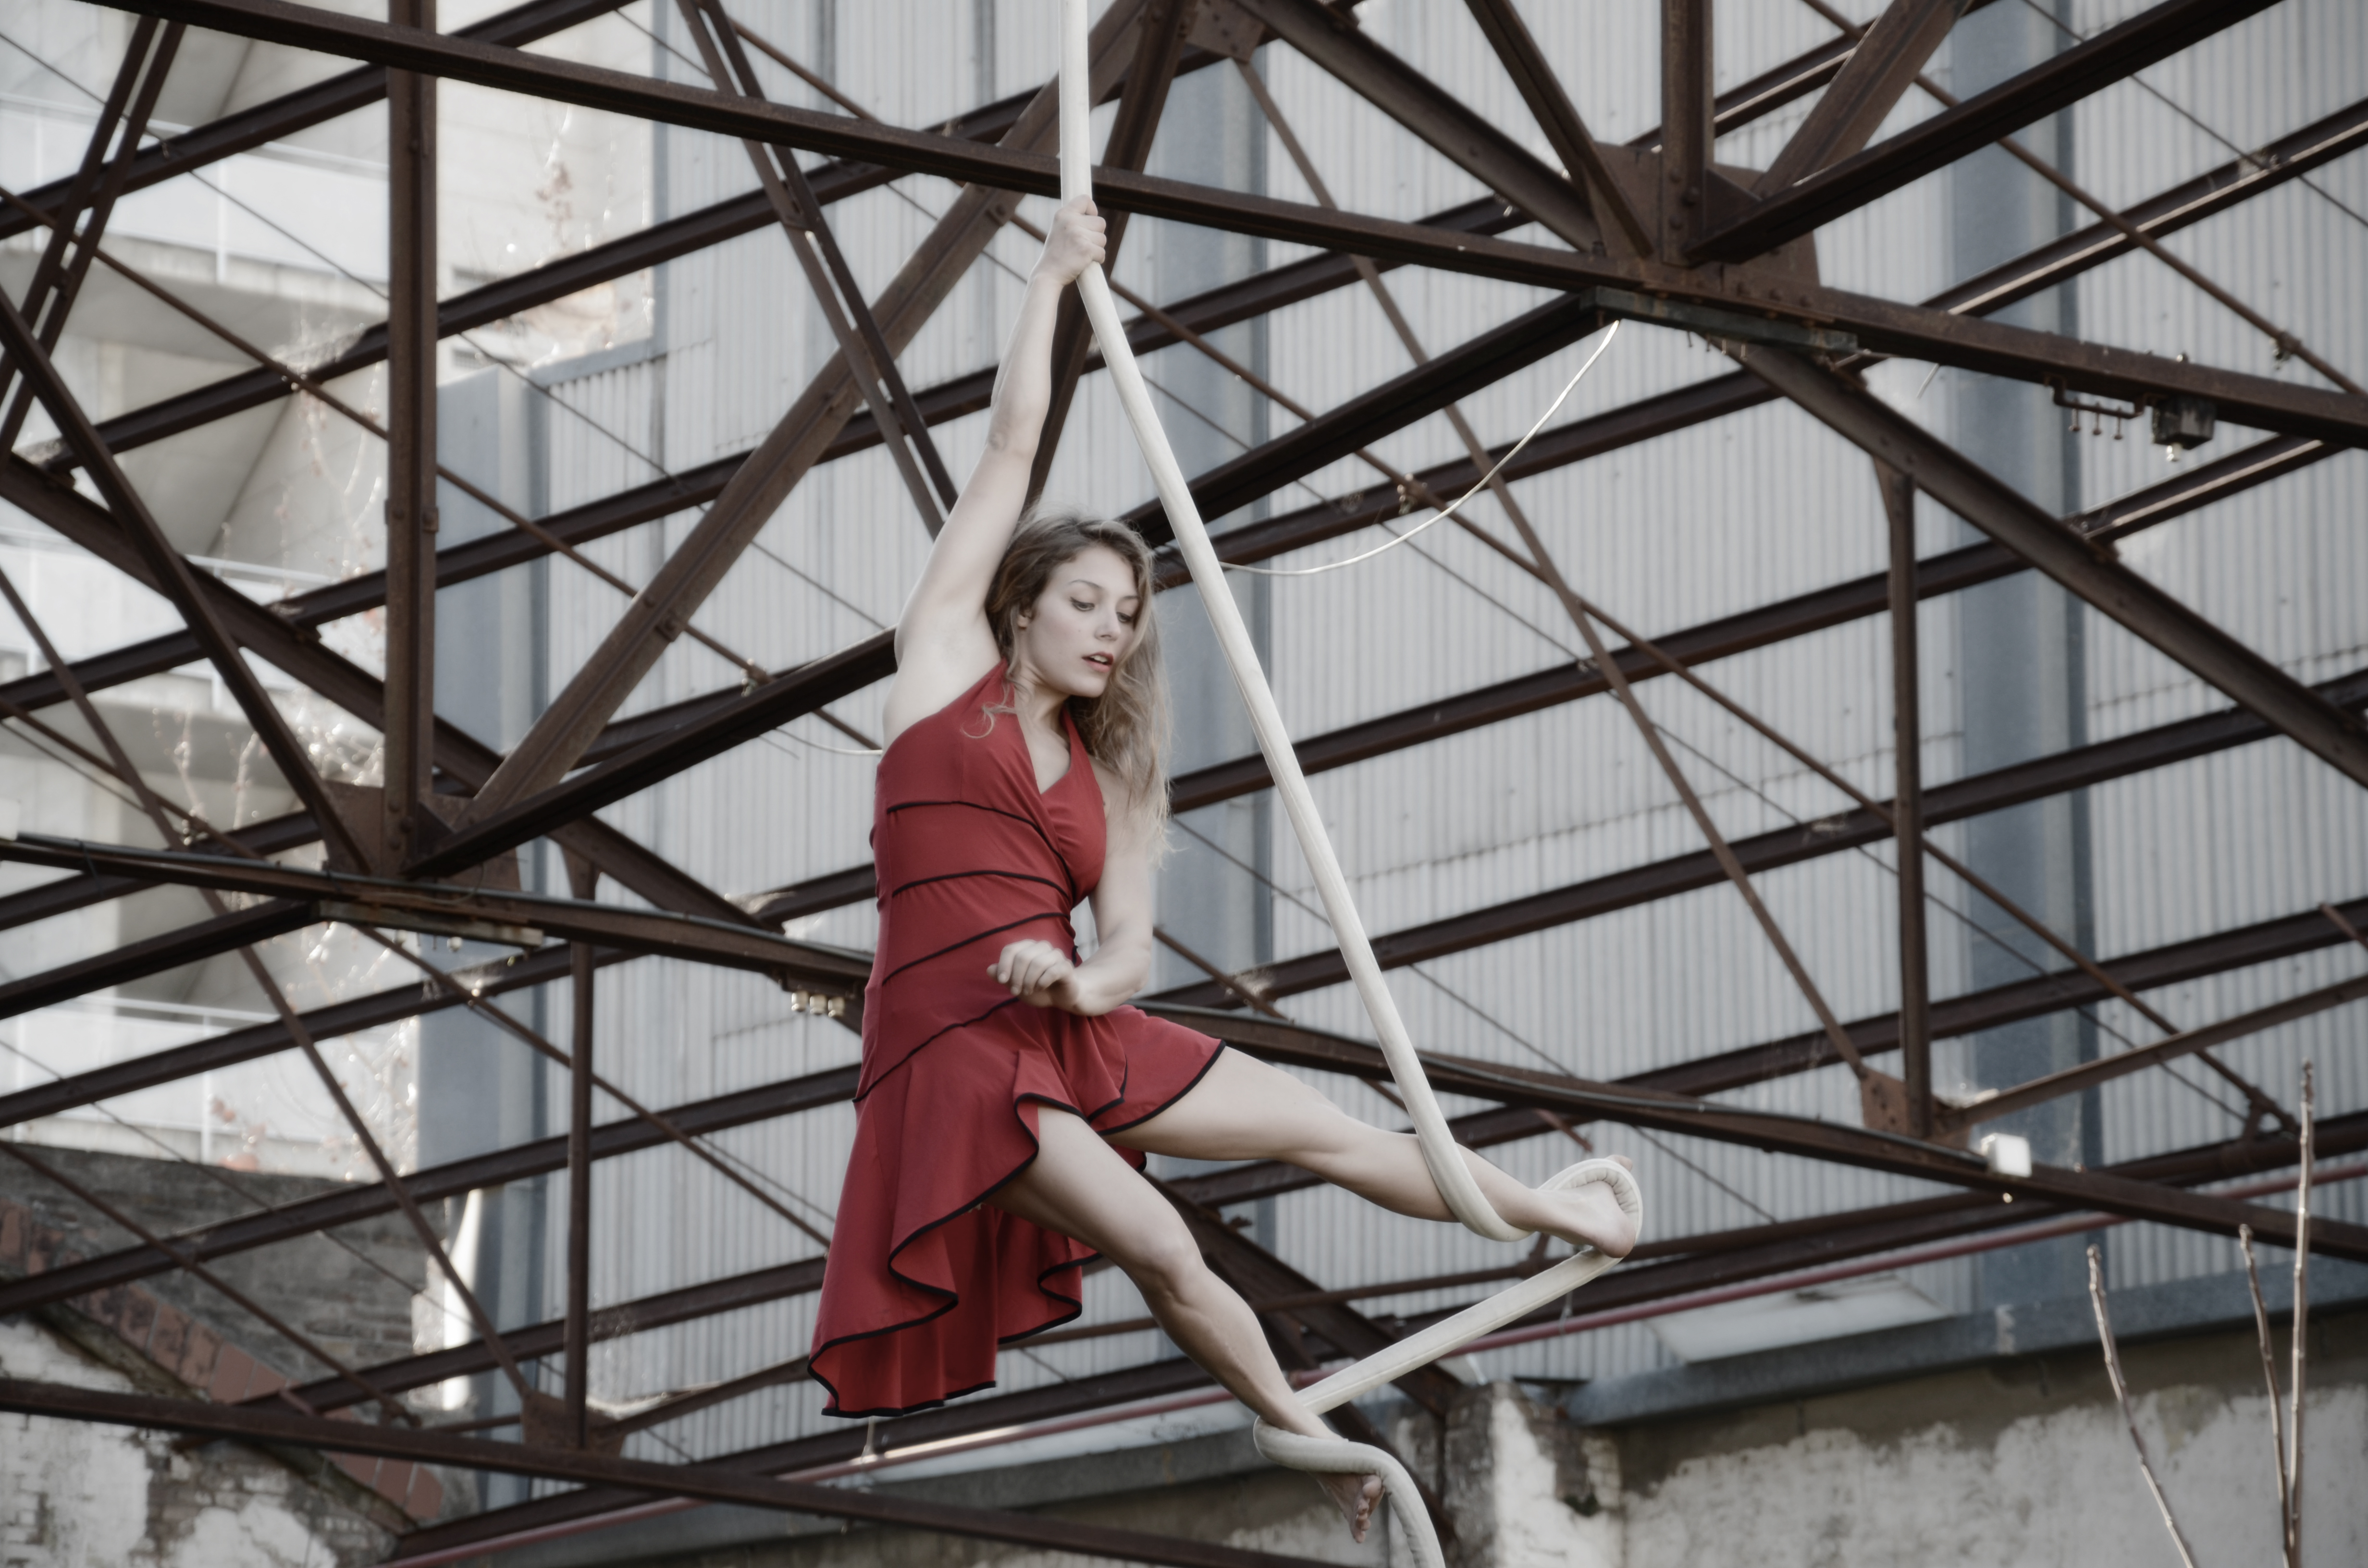 ragnatela acrobata aerea urban teatr